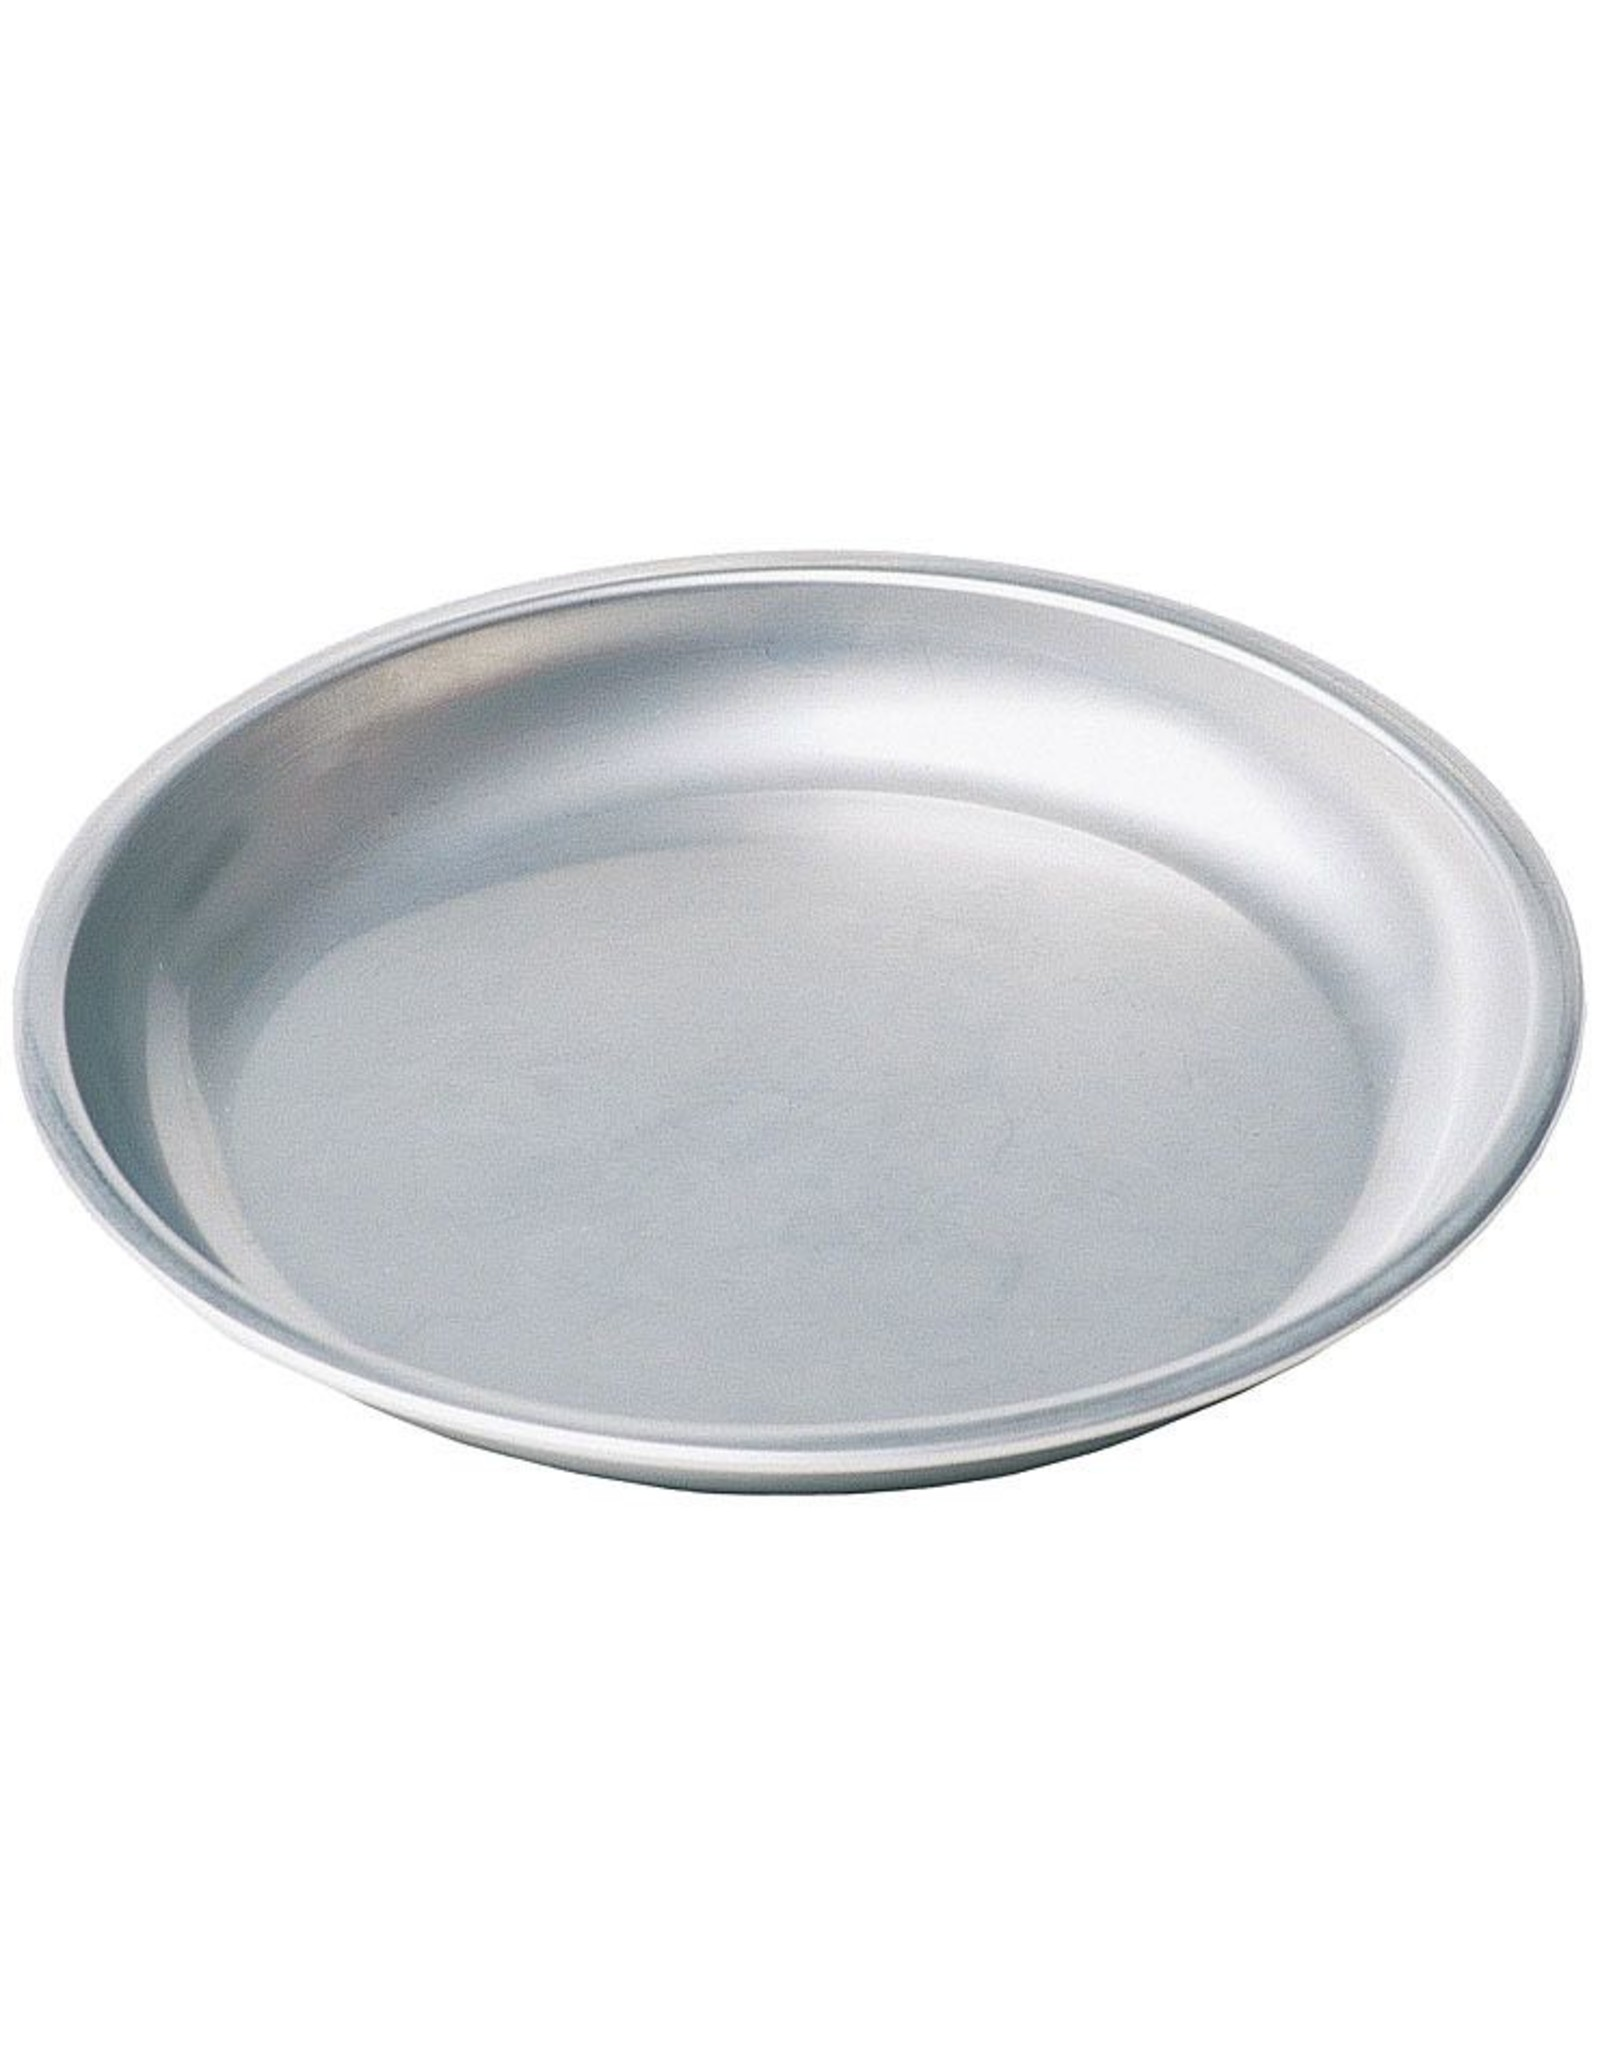 MSR MSR Alpine Plate